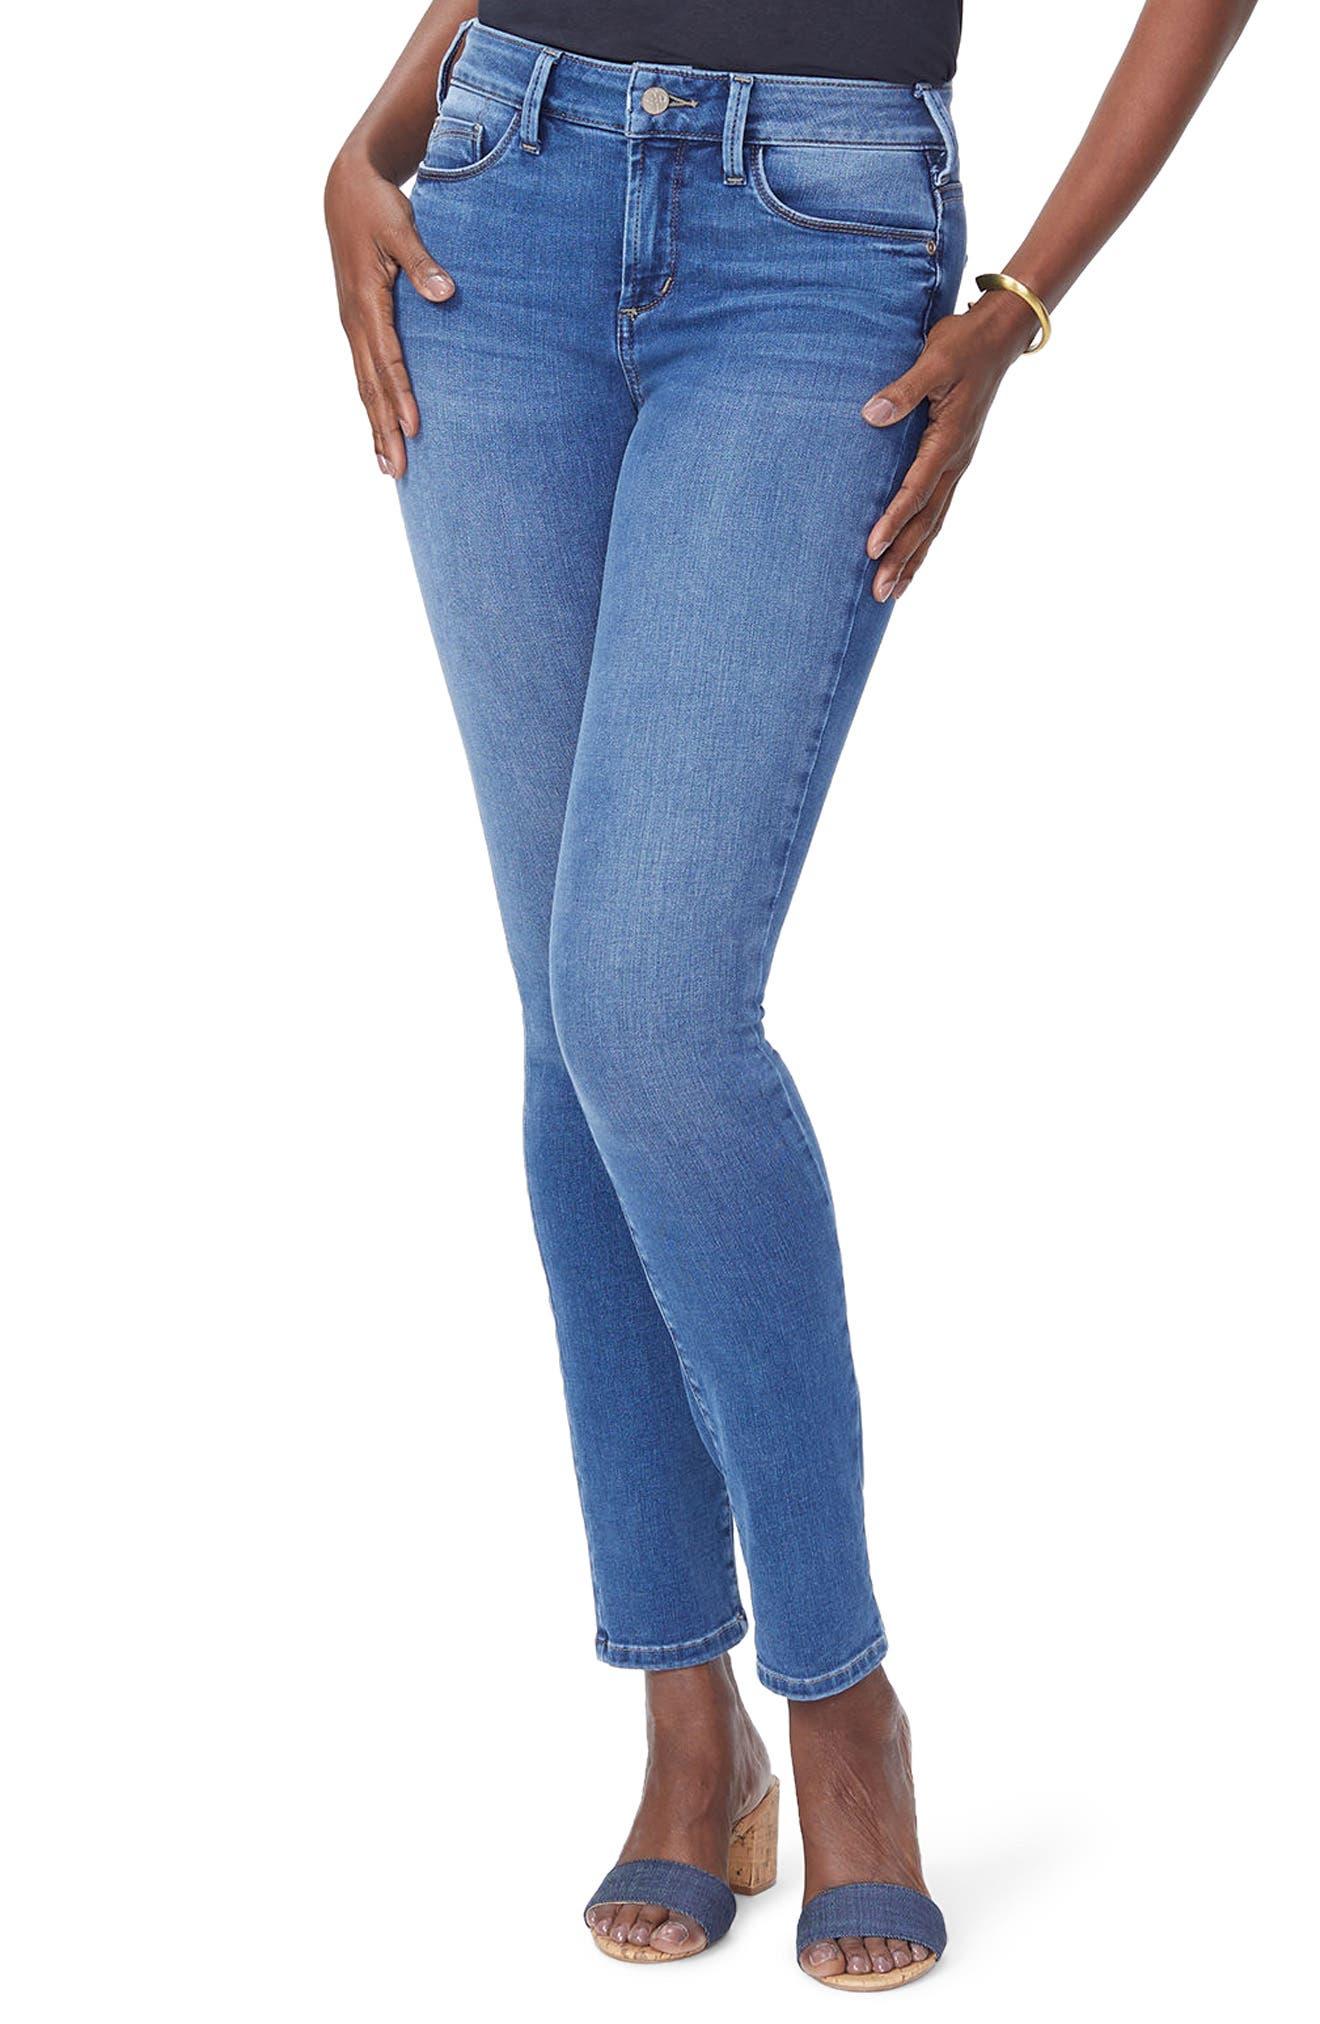 Alina Uplift Skinny Jeans,                             Main thumbnail 1, color,                             Oasis